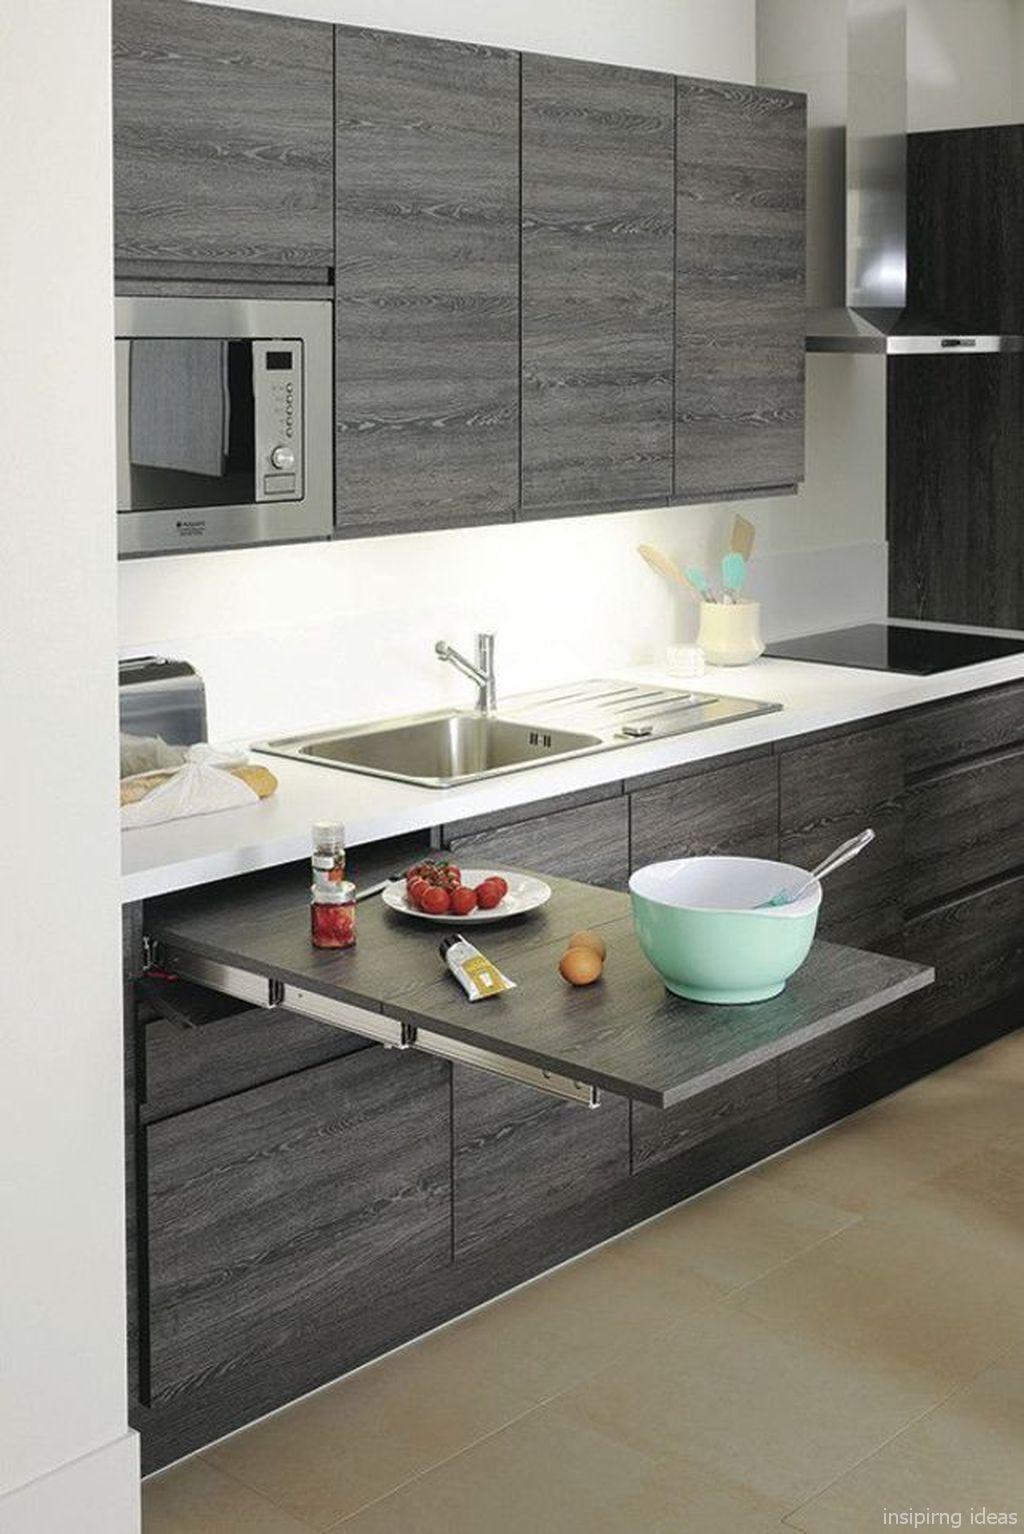 Luxury Modern Kitchen Design Ideas 9 kitchendesign   Small ...